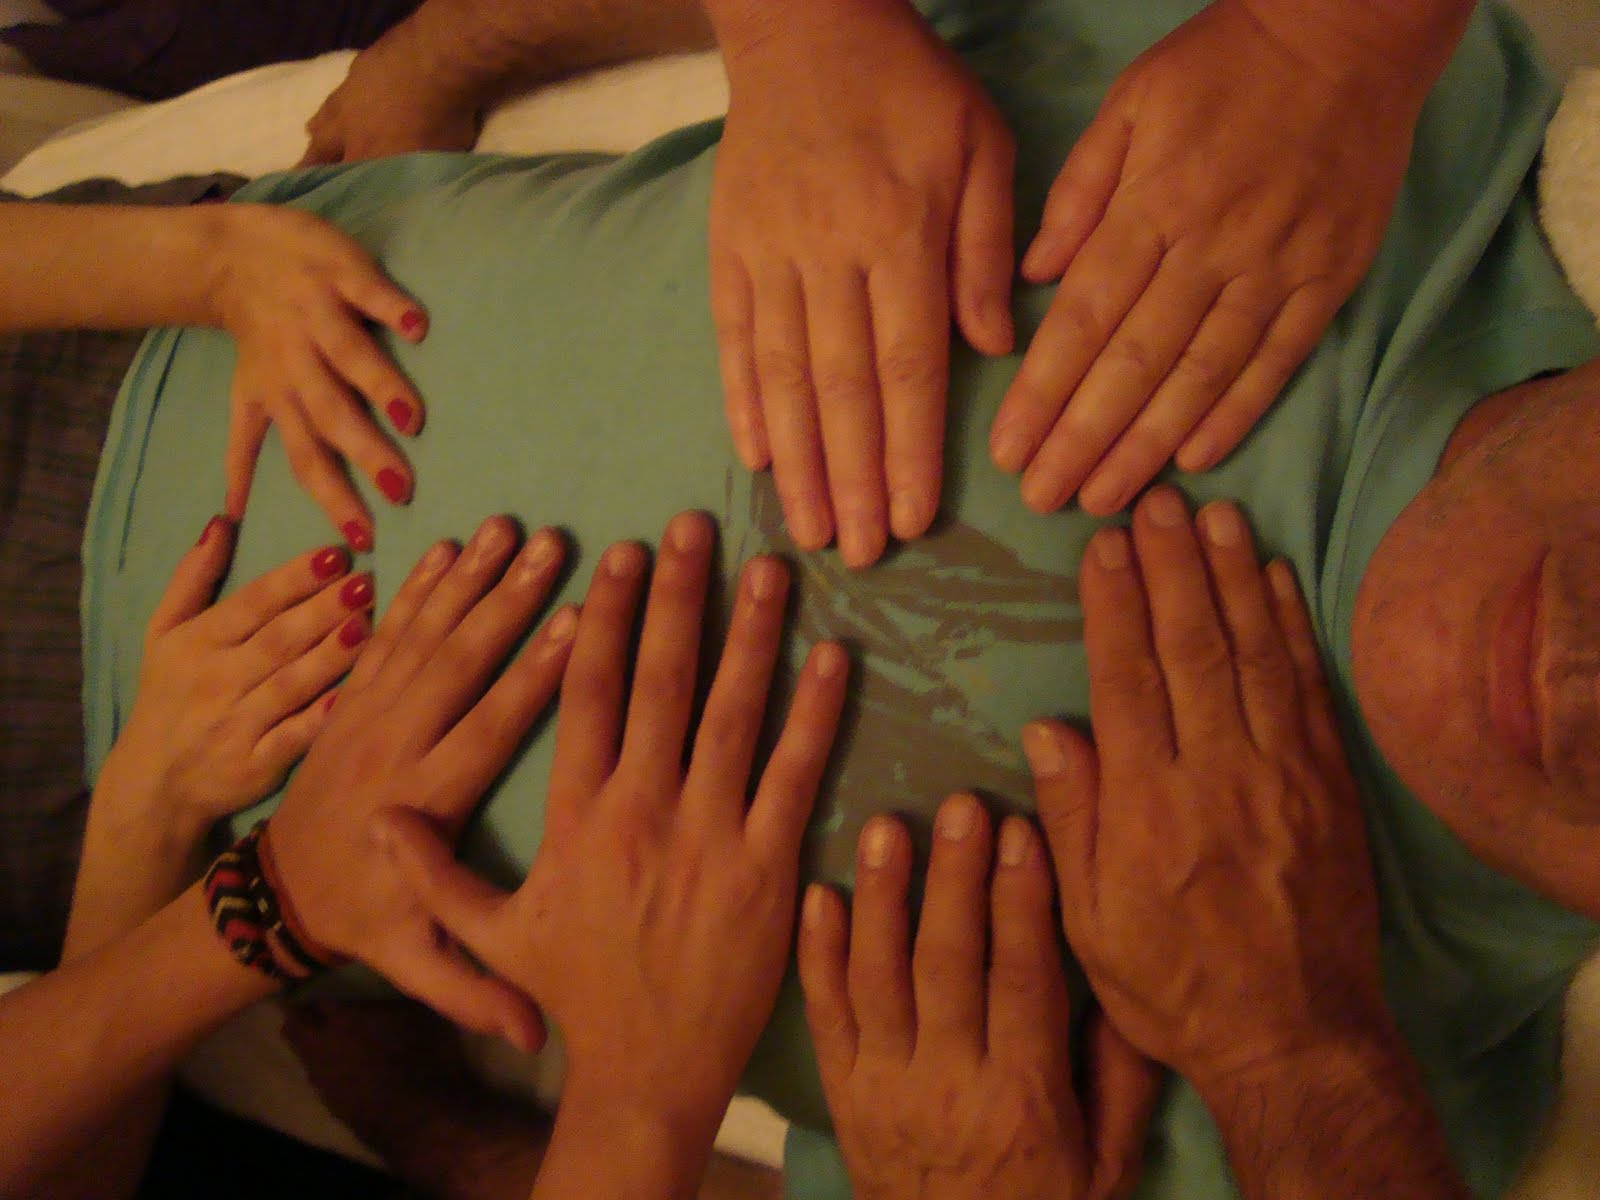 Reiki grupal